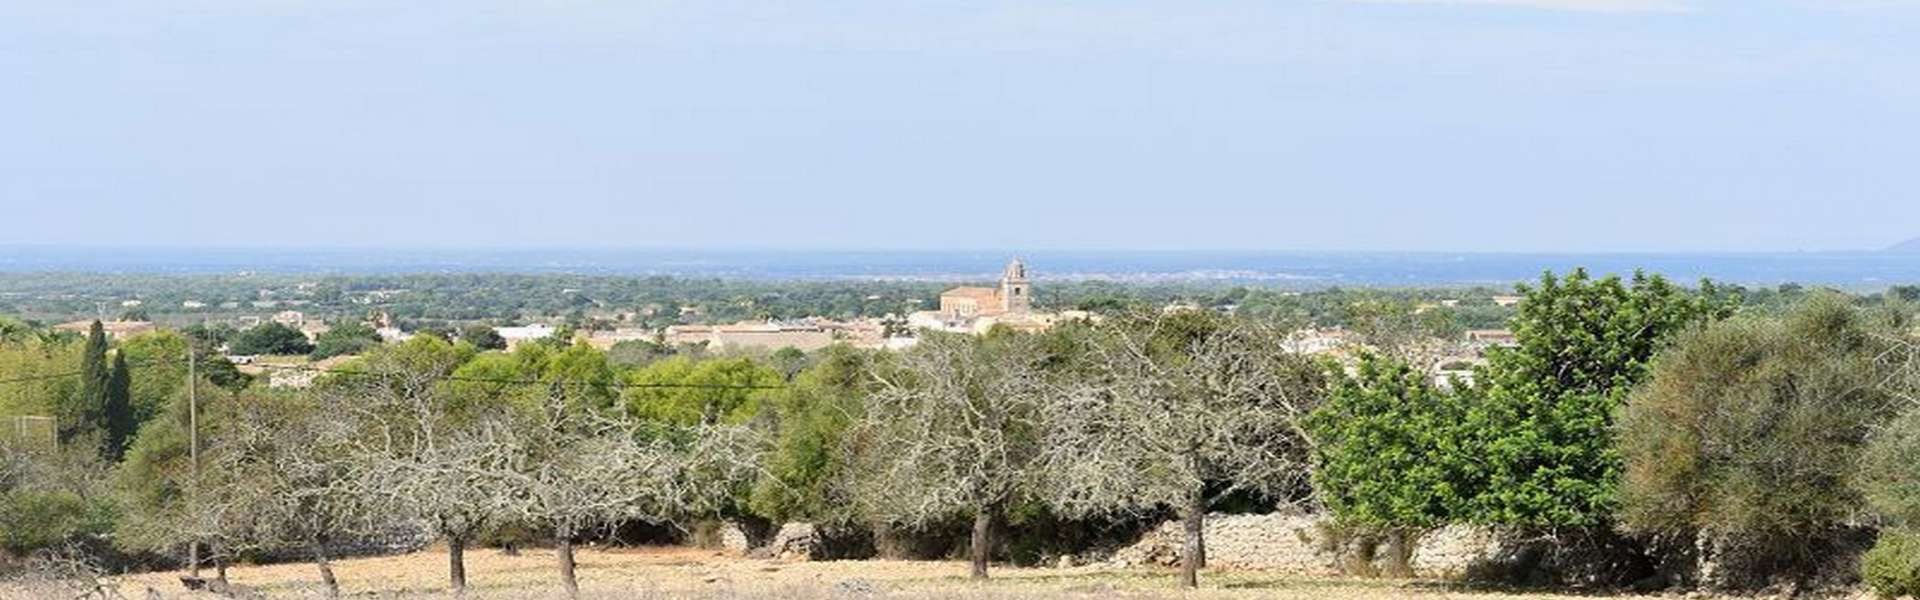 Cas Concos - Finca-Baugrundstück mit Panoramablick und Lizenz